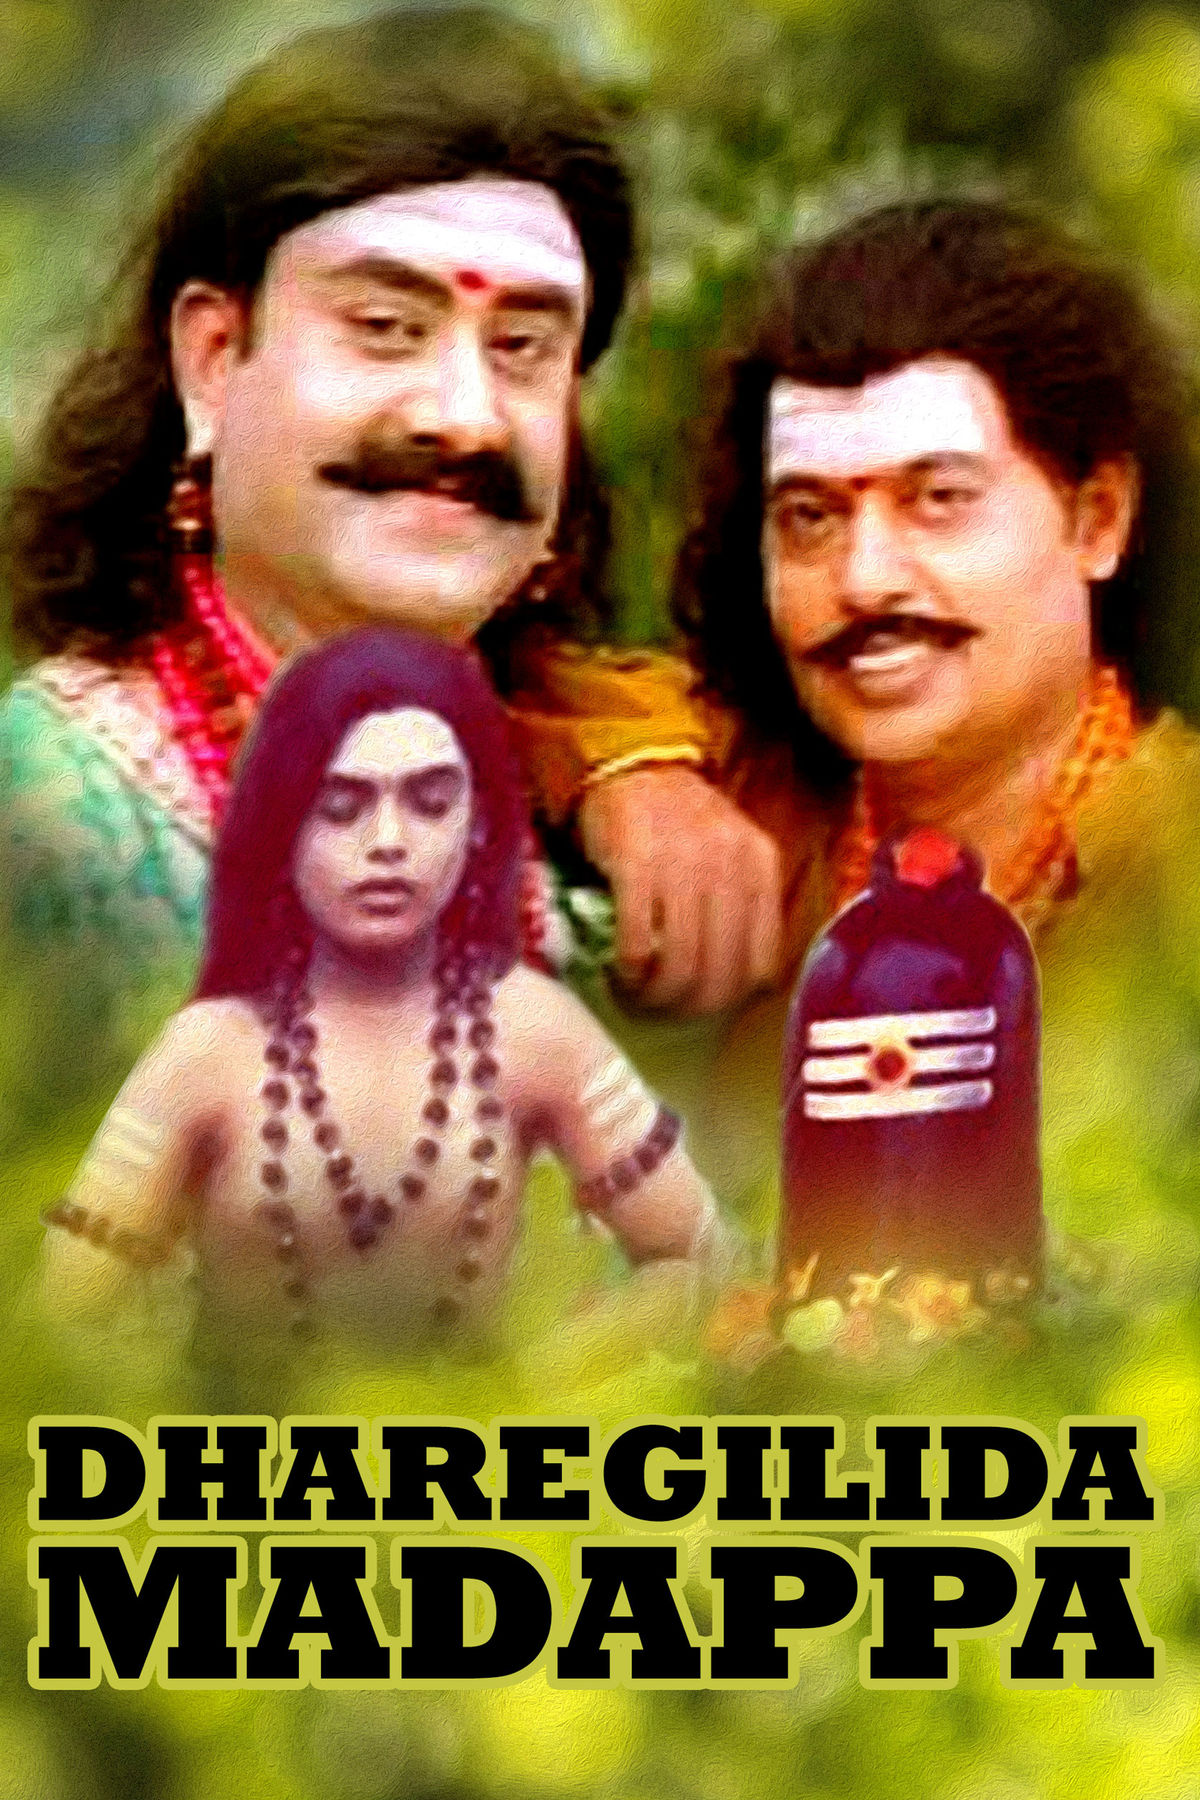 Yuvaraj Best Movies, TV Shows and Web Series List